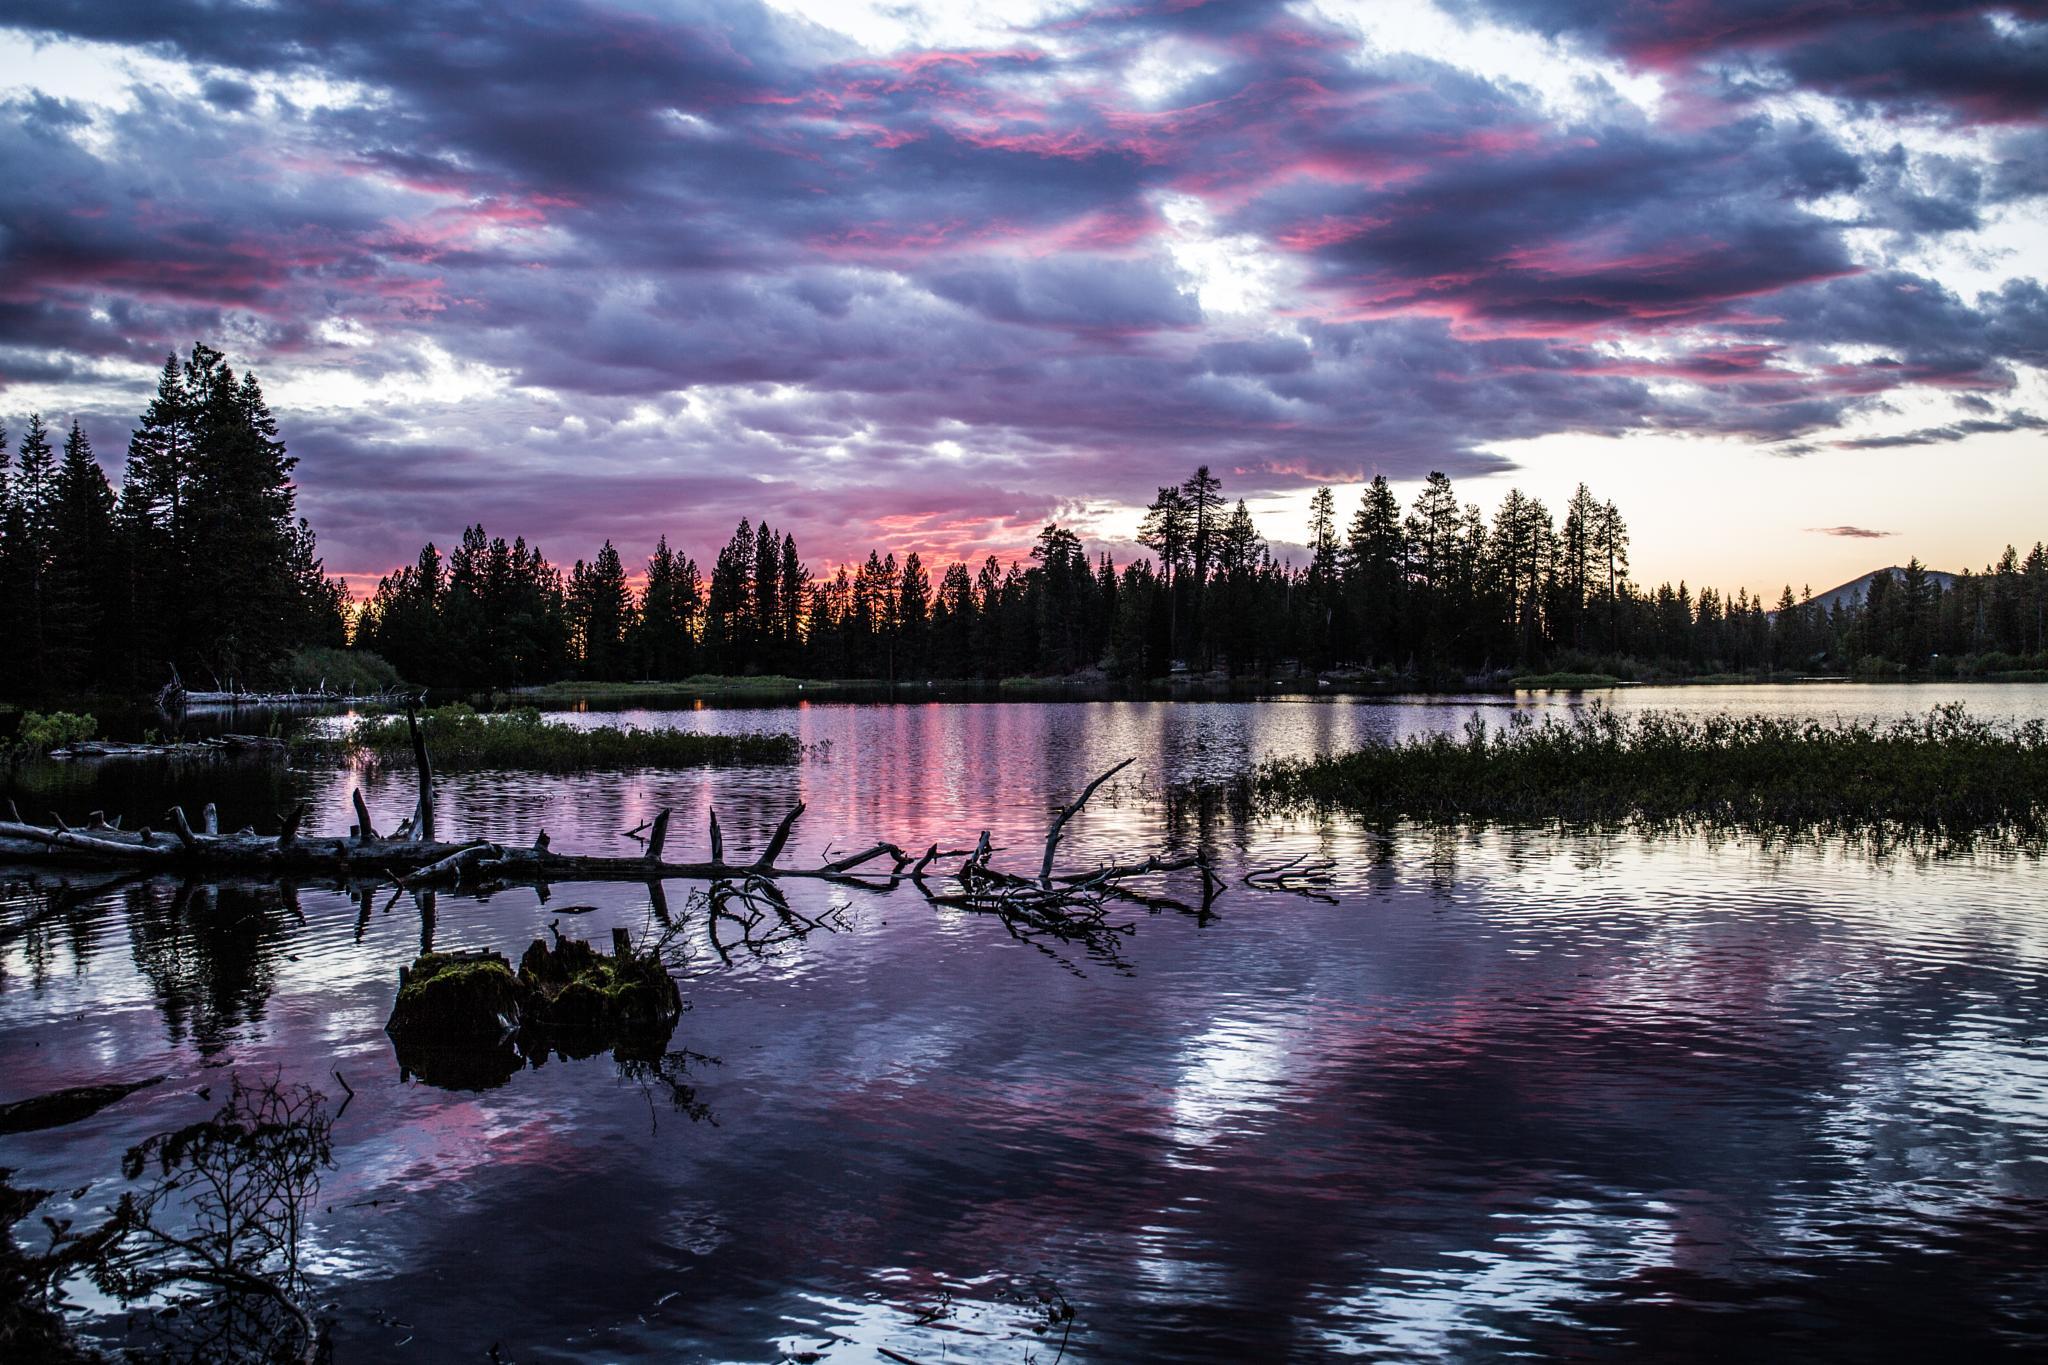 Mountain Lake Sunset by caseyonamission